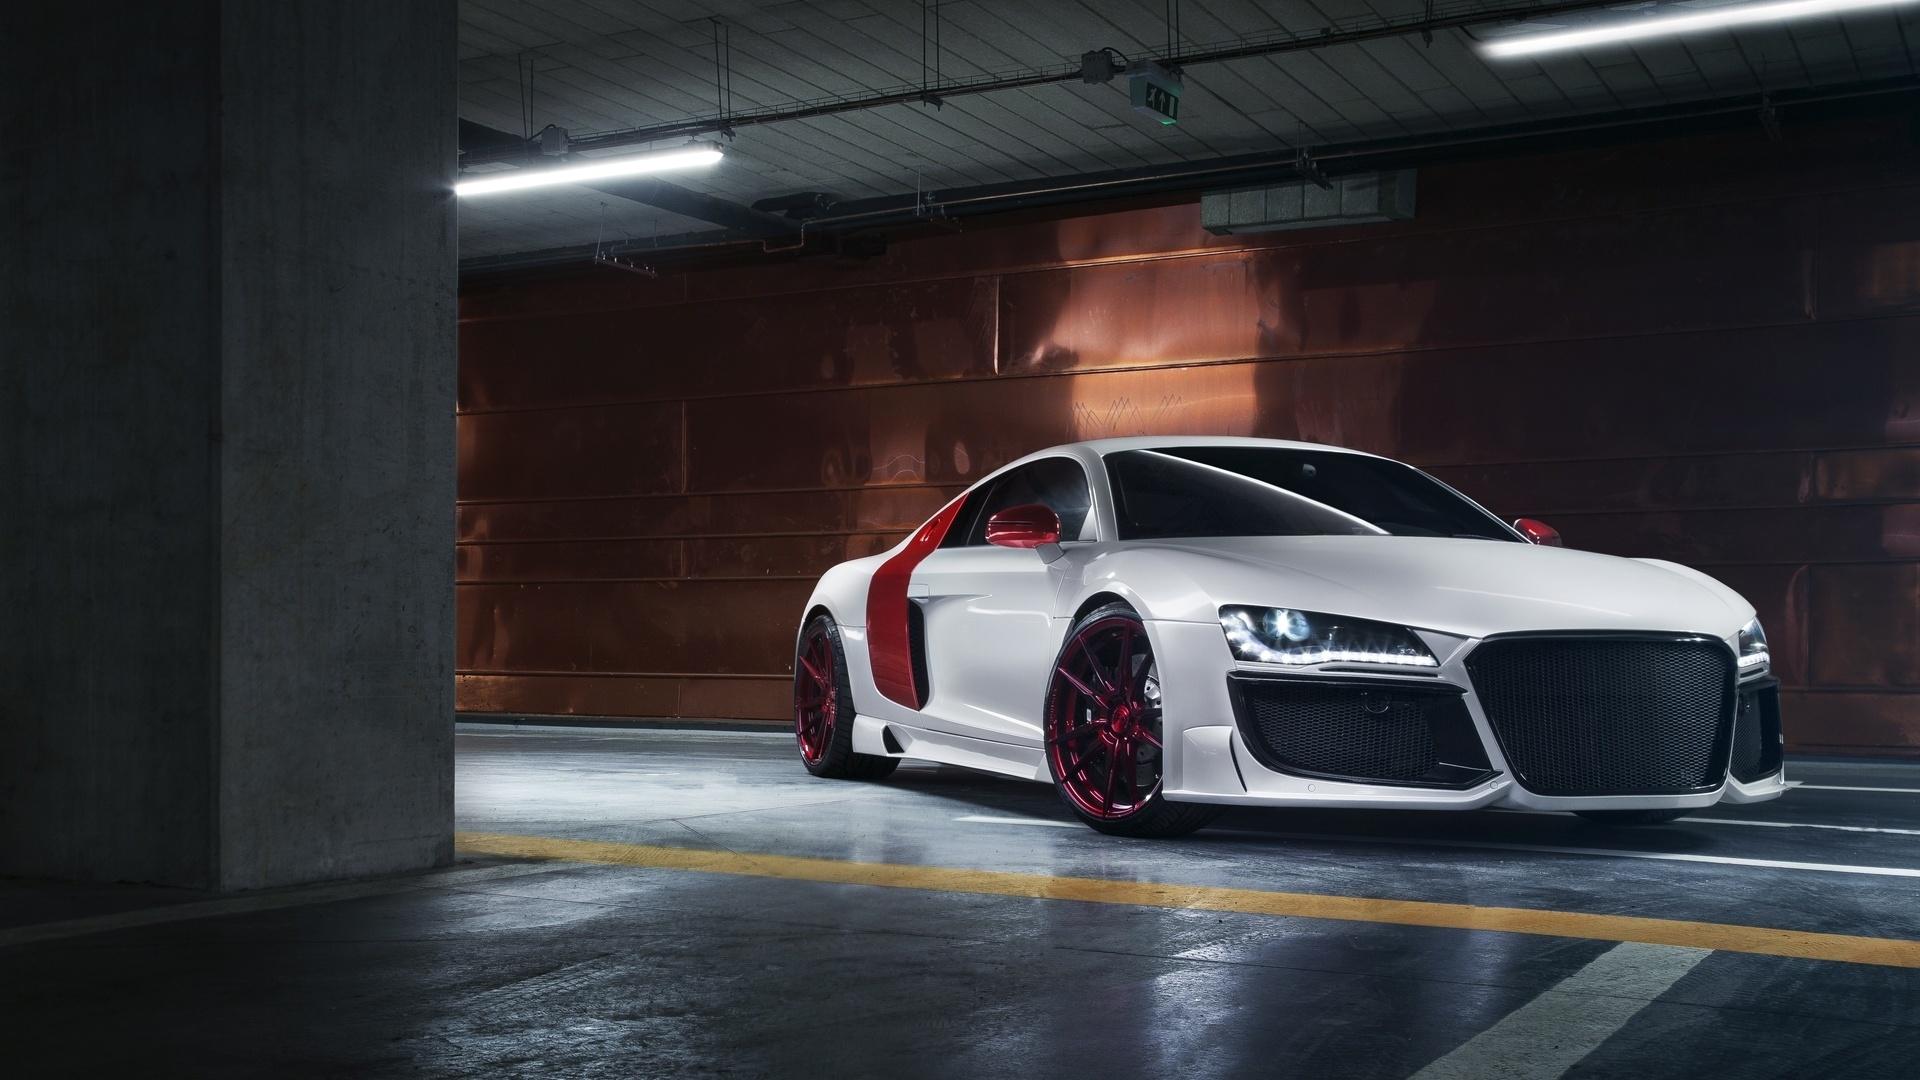 Audi R8 free wallpaper